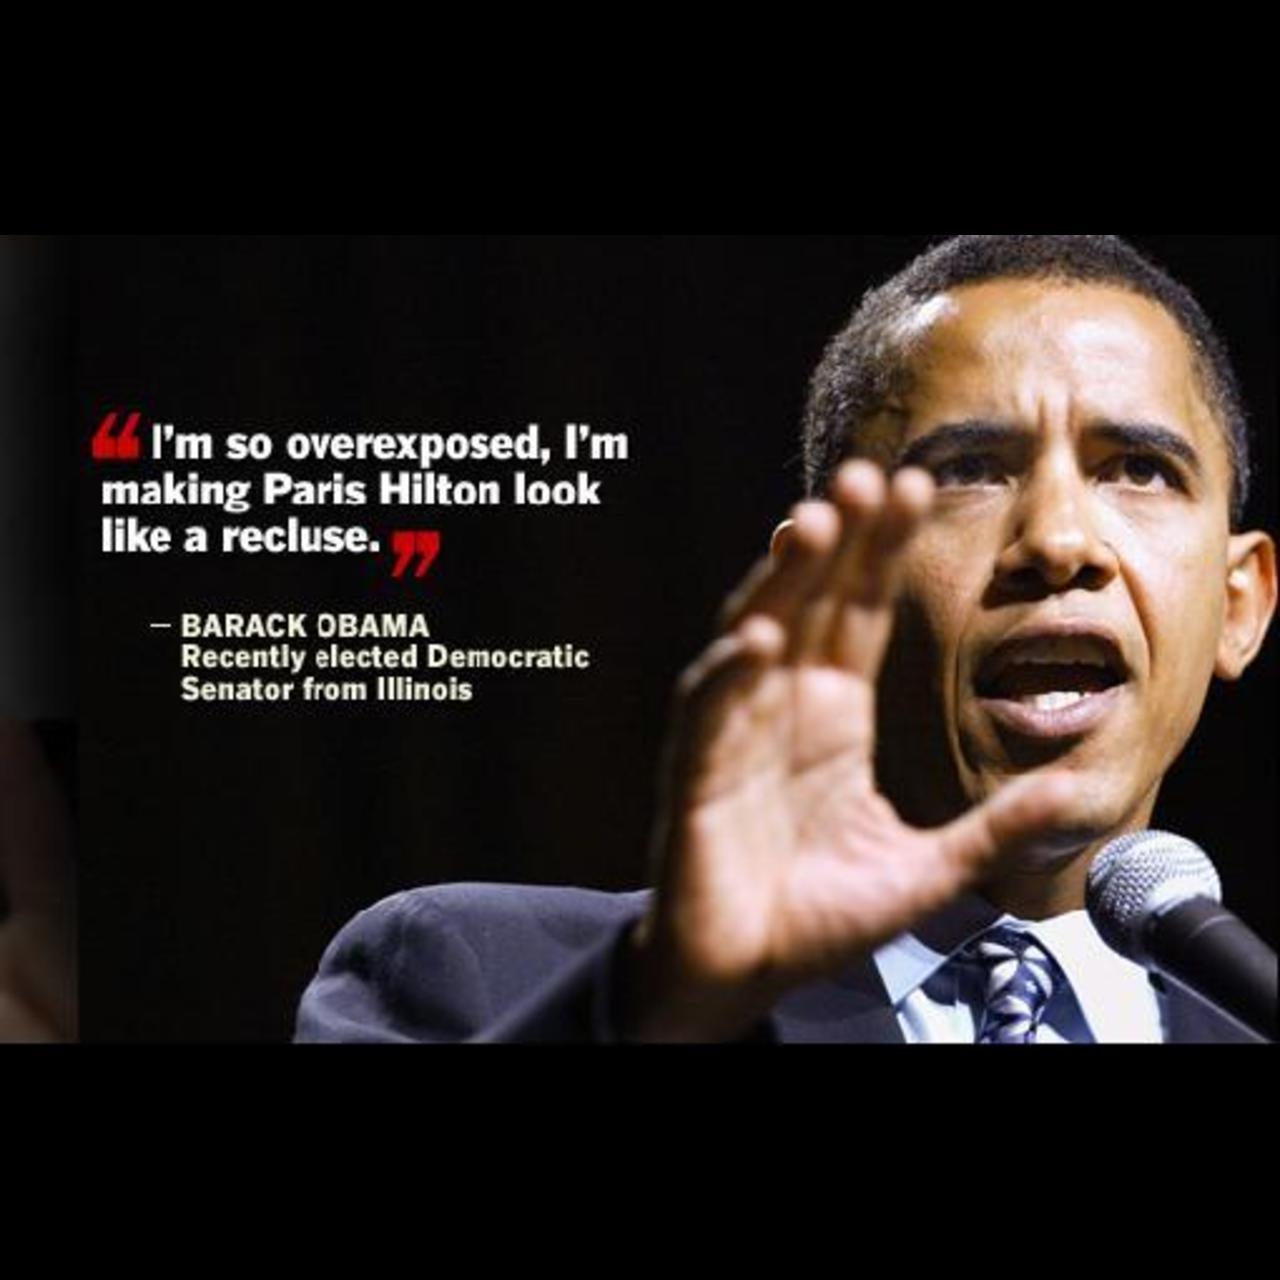 Funny Anti Obama Jokes wwwgalleryhipcom   The Hippest Pics 1280x1280